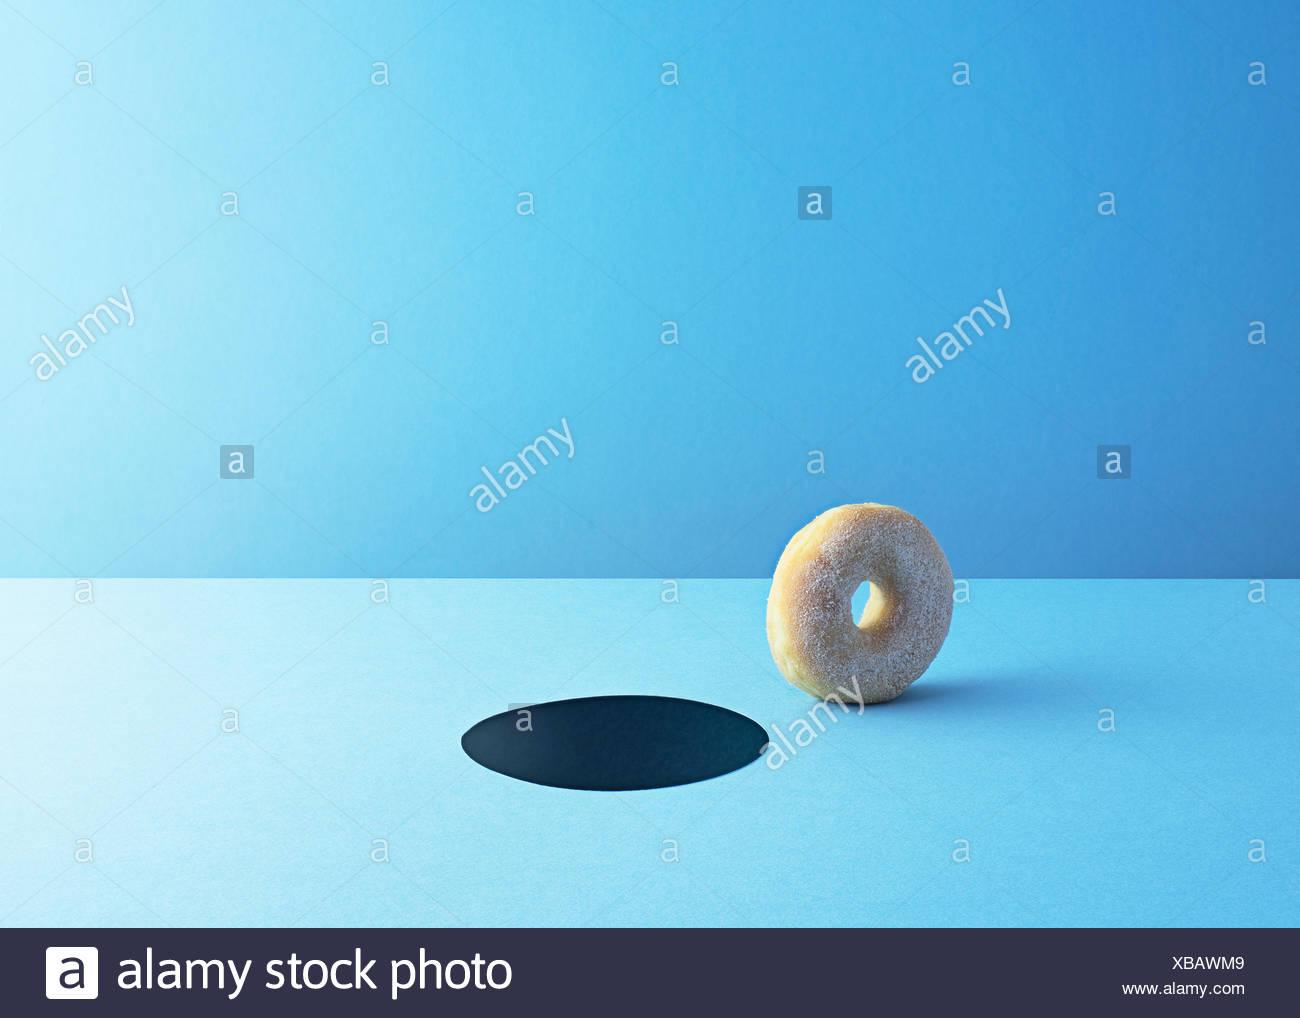 Doughnut and hole on light blue ground - Stock Image